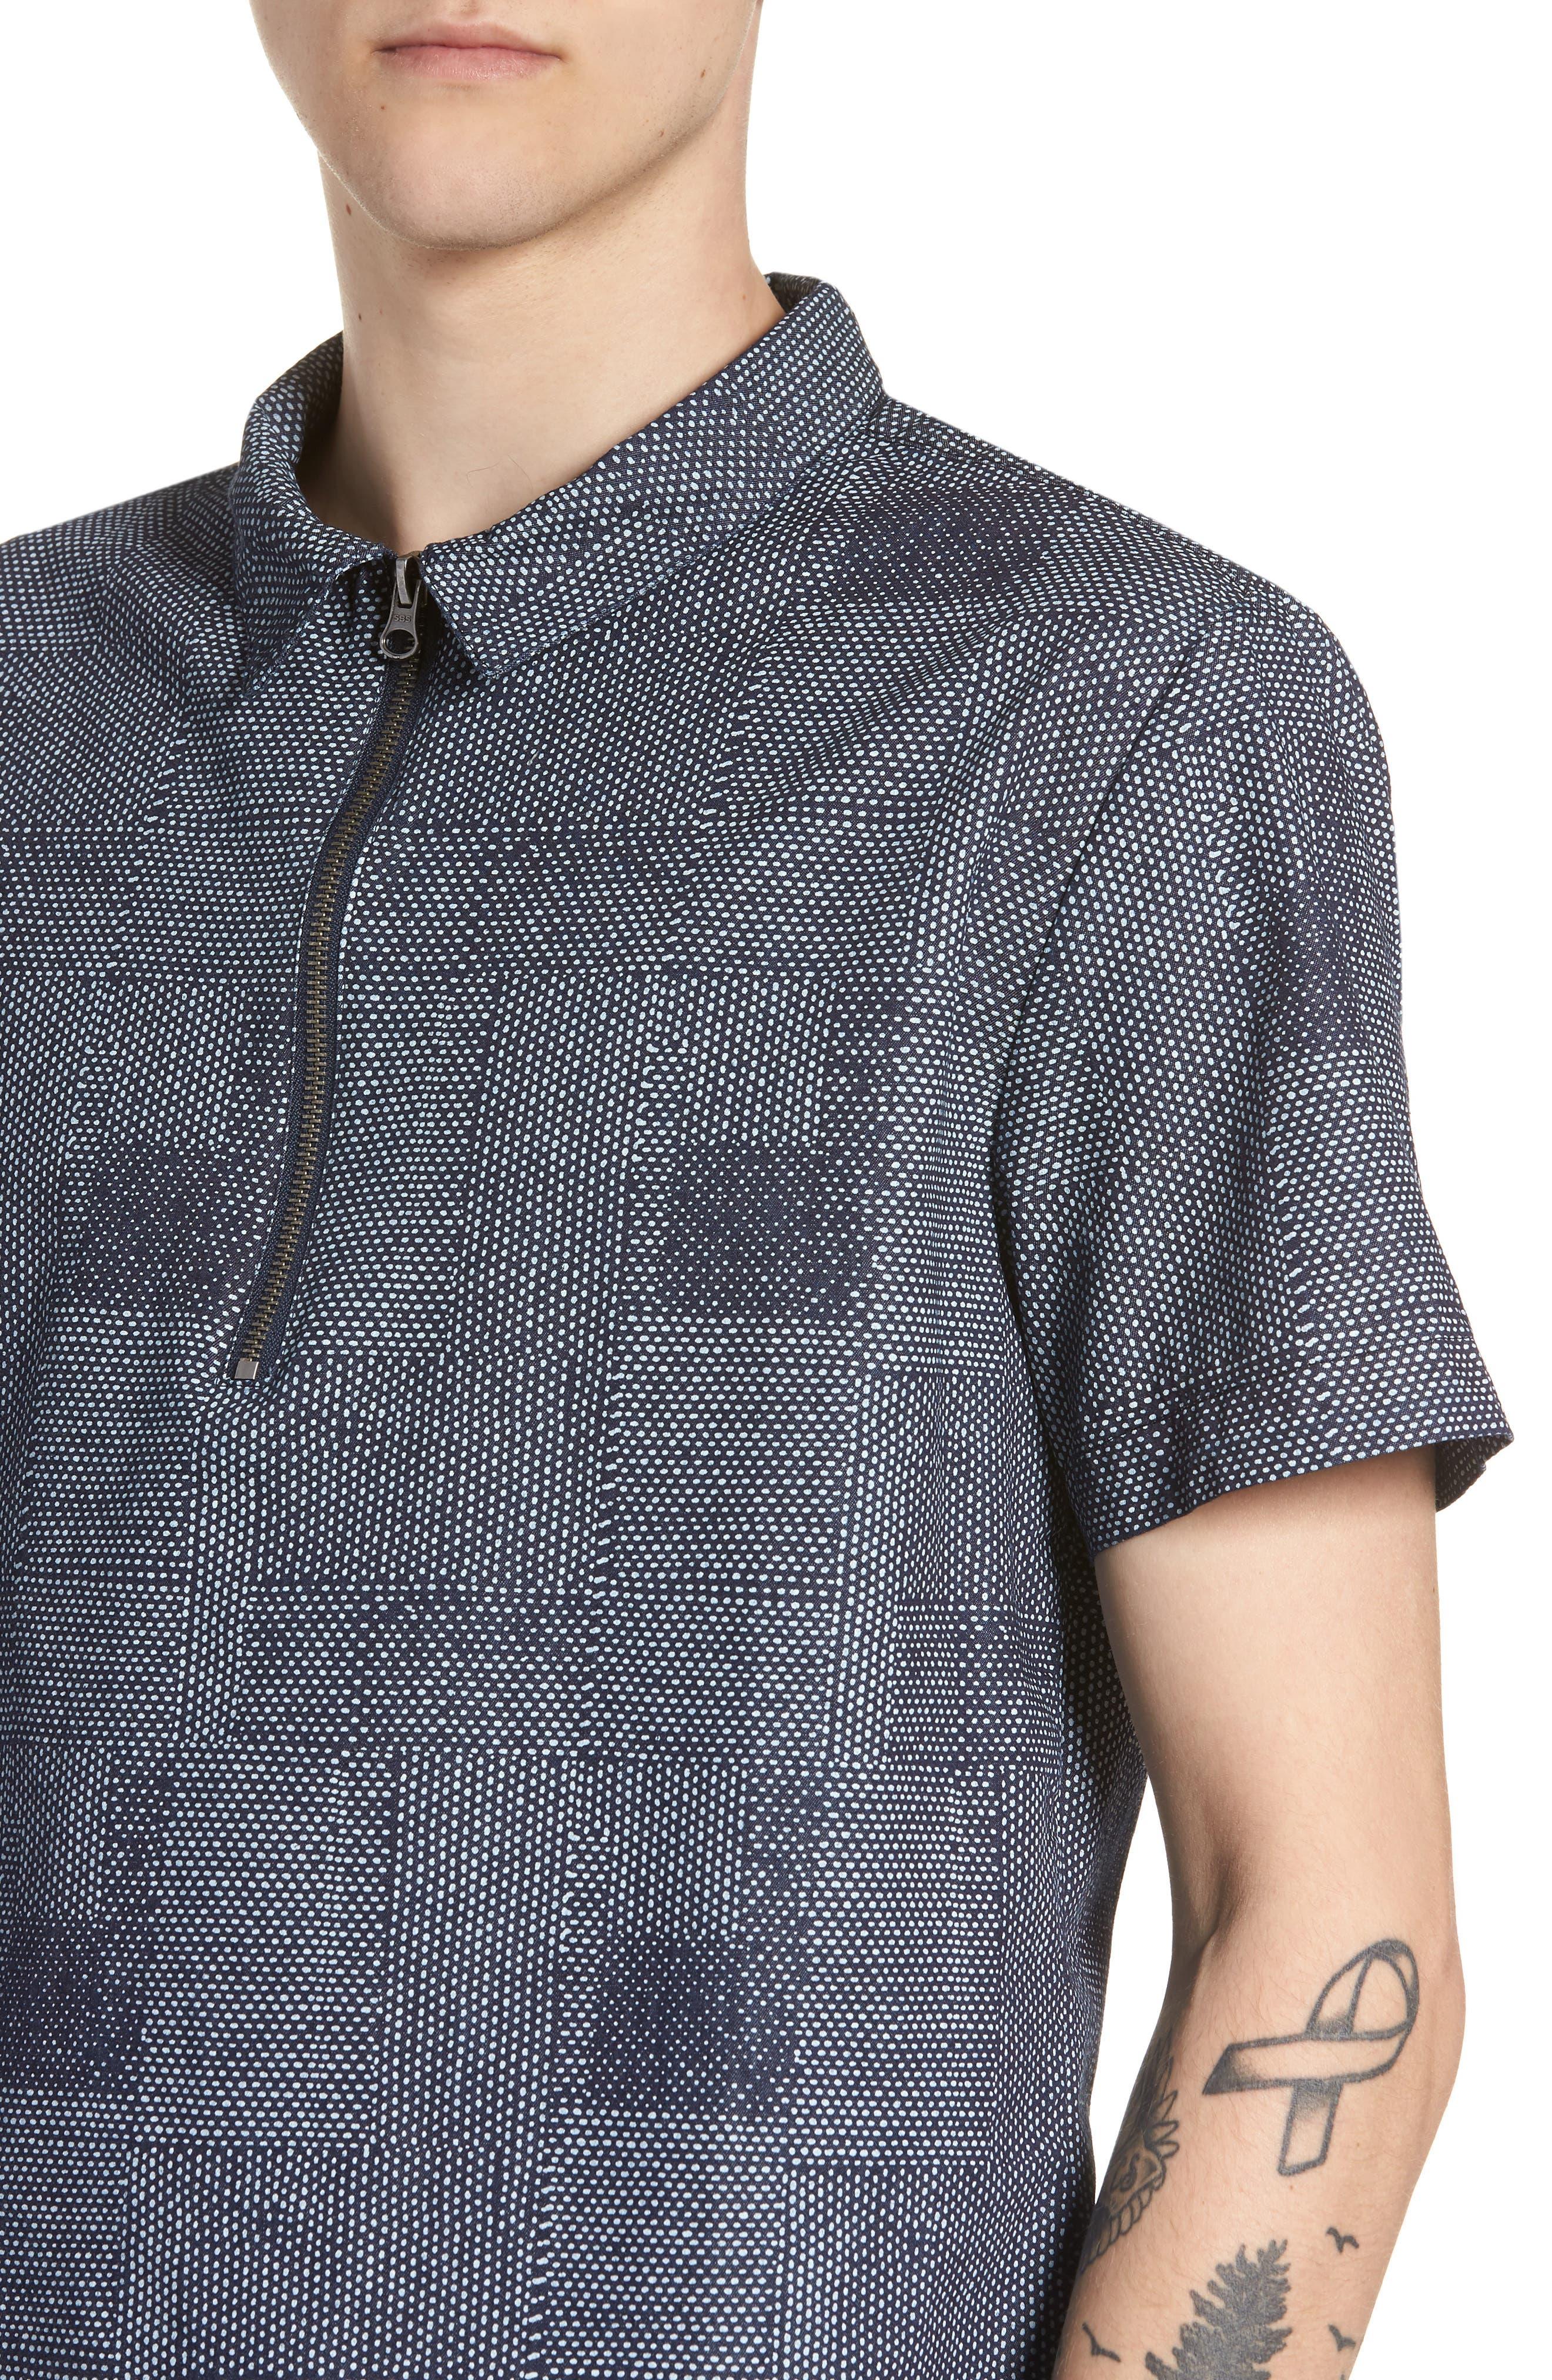 Dotpatch Woven Shirt,                             Alternate thumbnail 2, color,                             Indigo